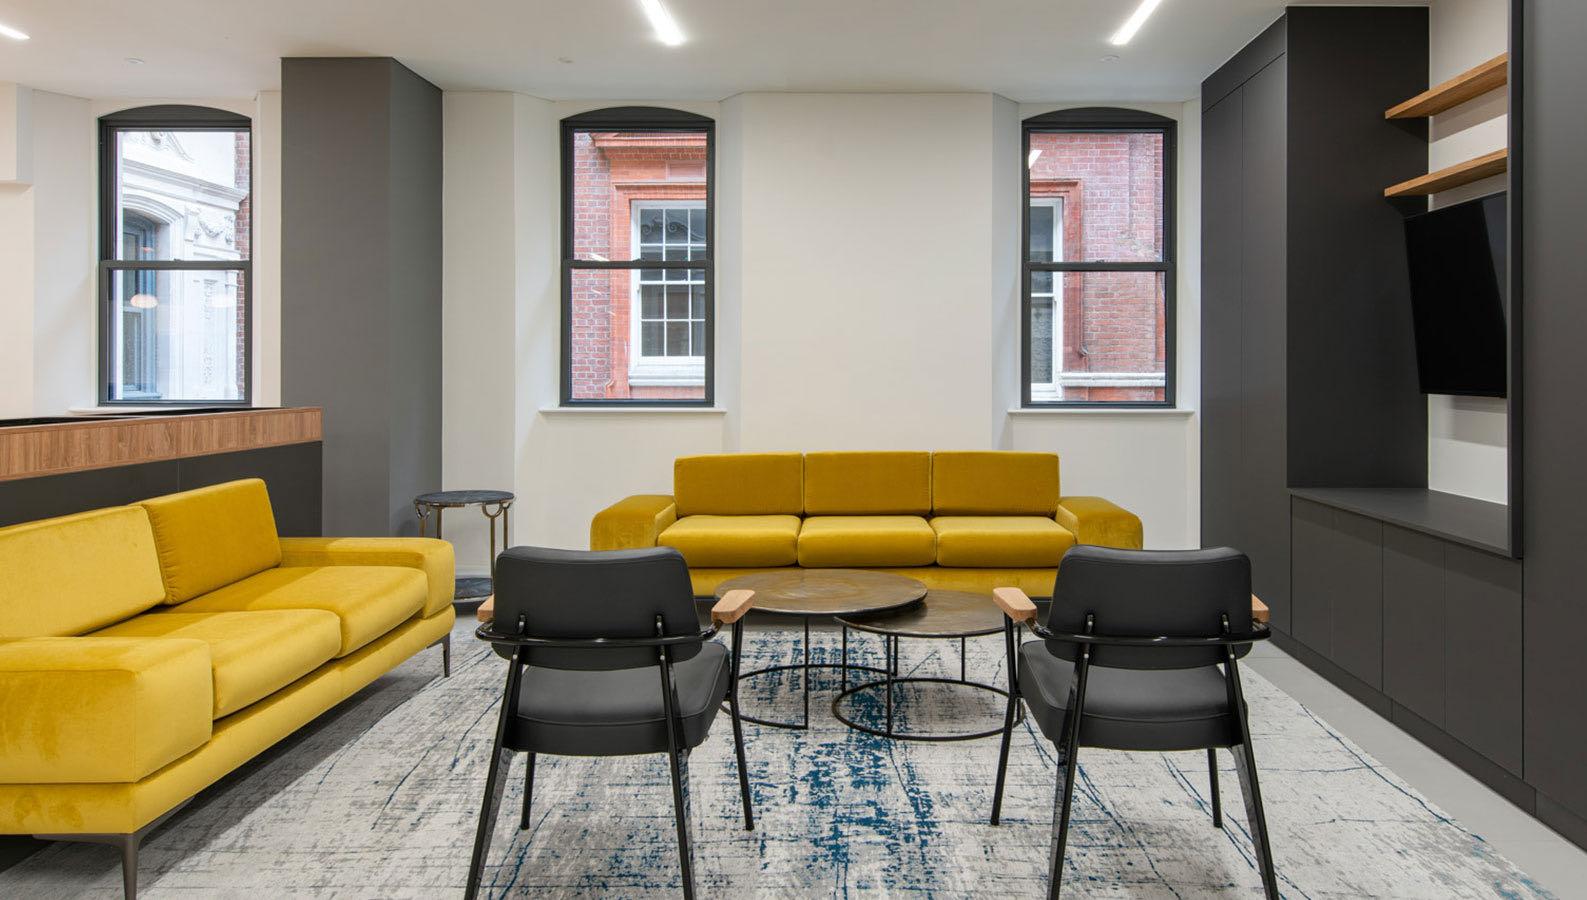 polen-capital-london-office-1